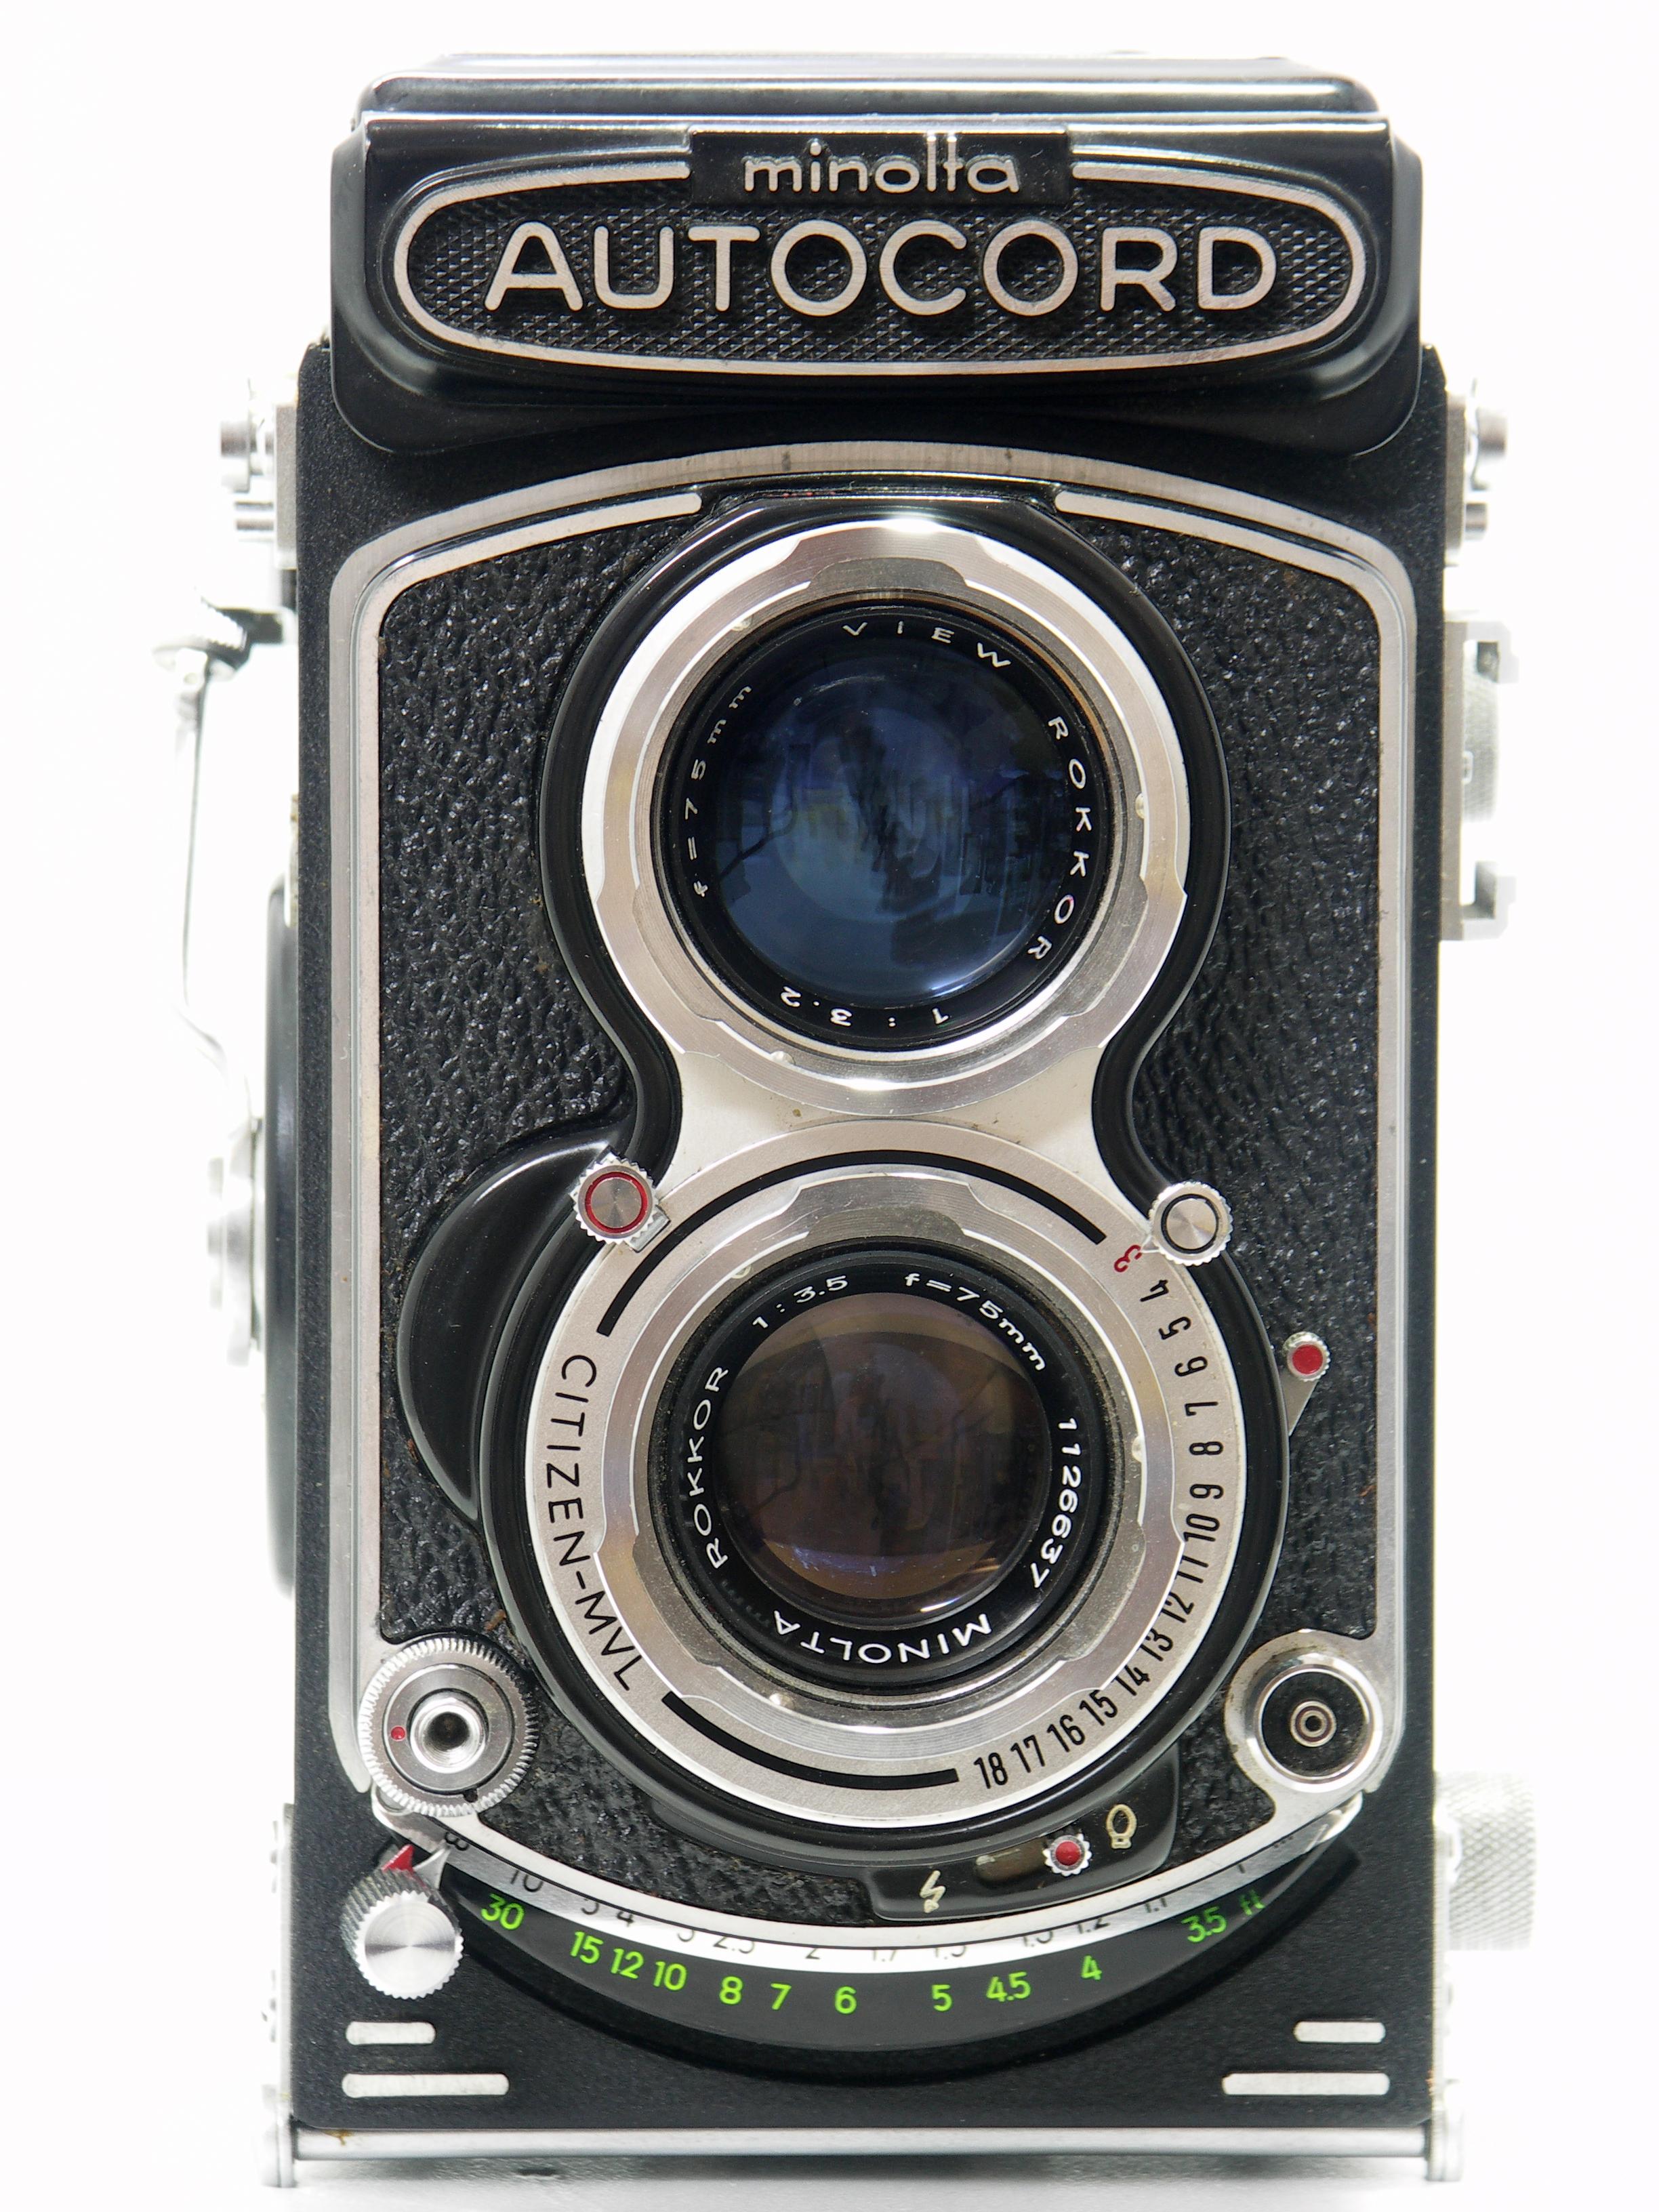 MINOLTA AUTOCORD | CameraShiz!